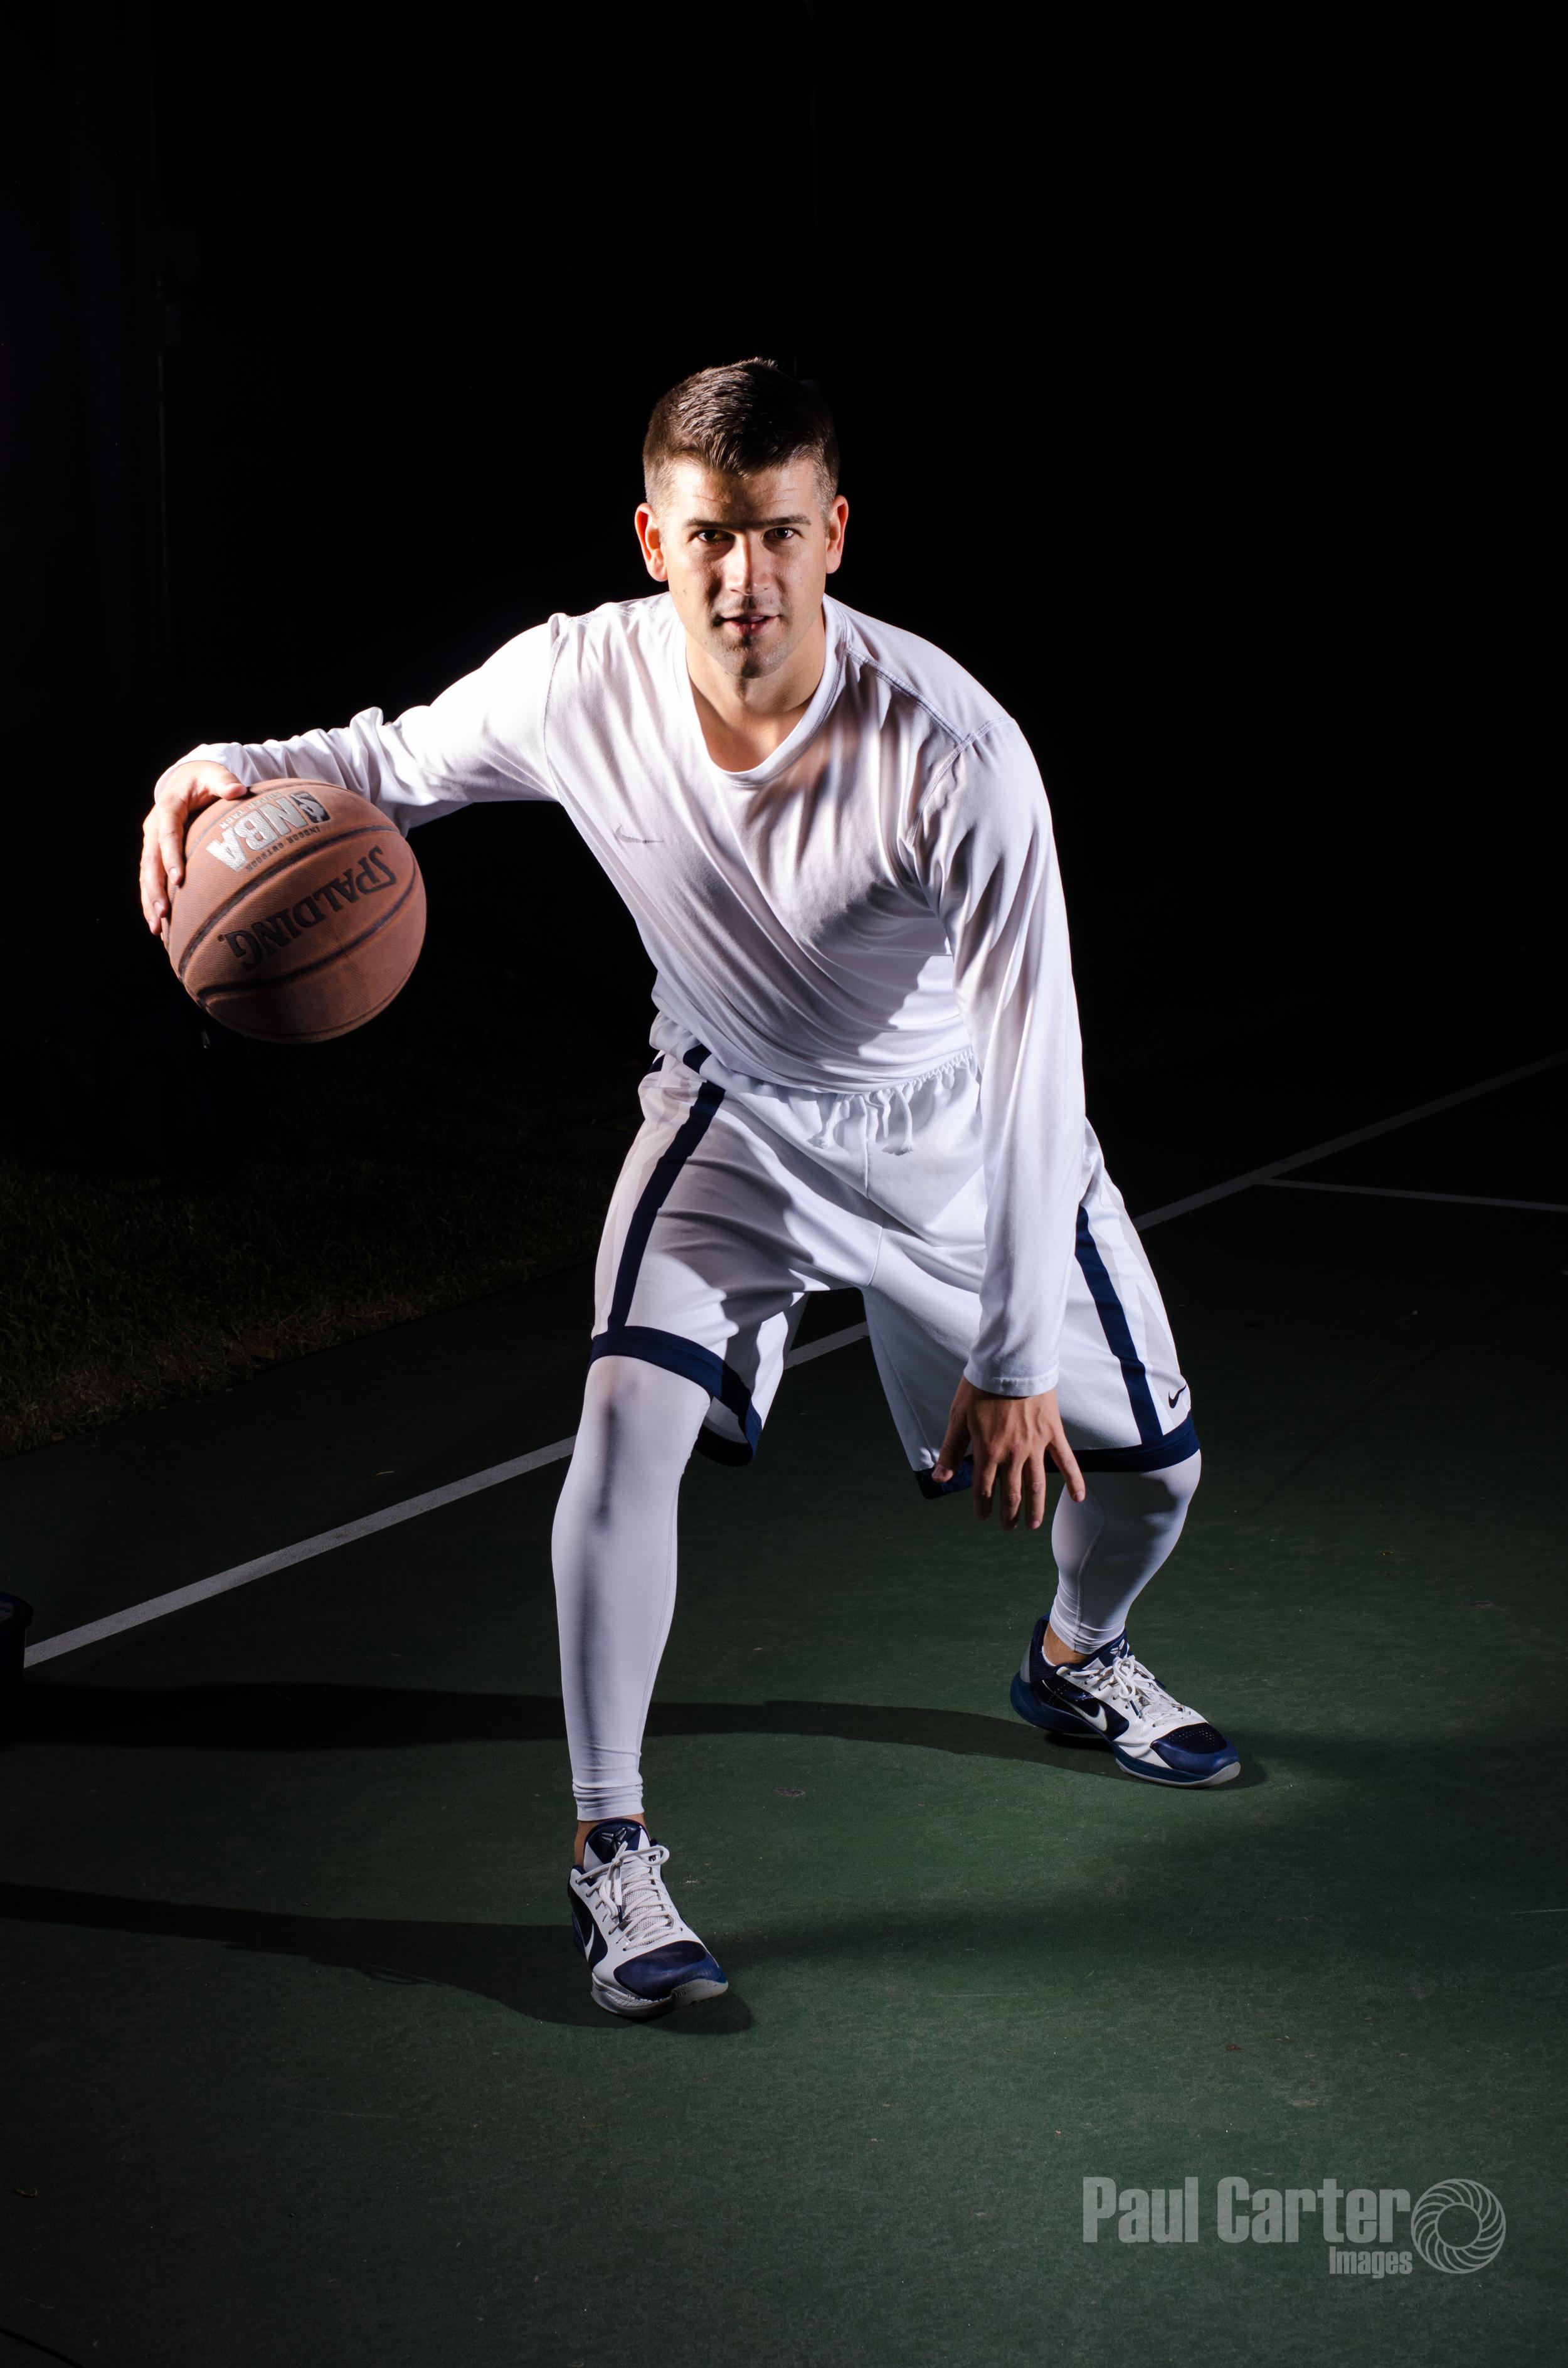 Basketball portrait